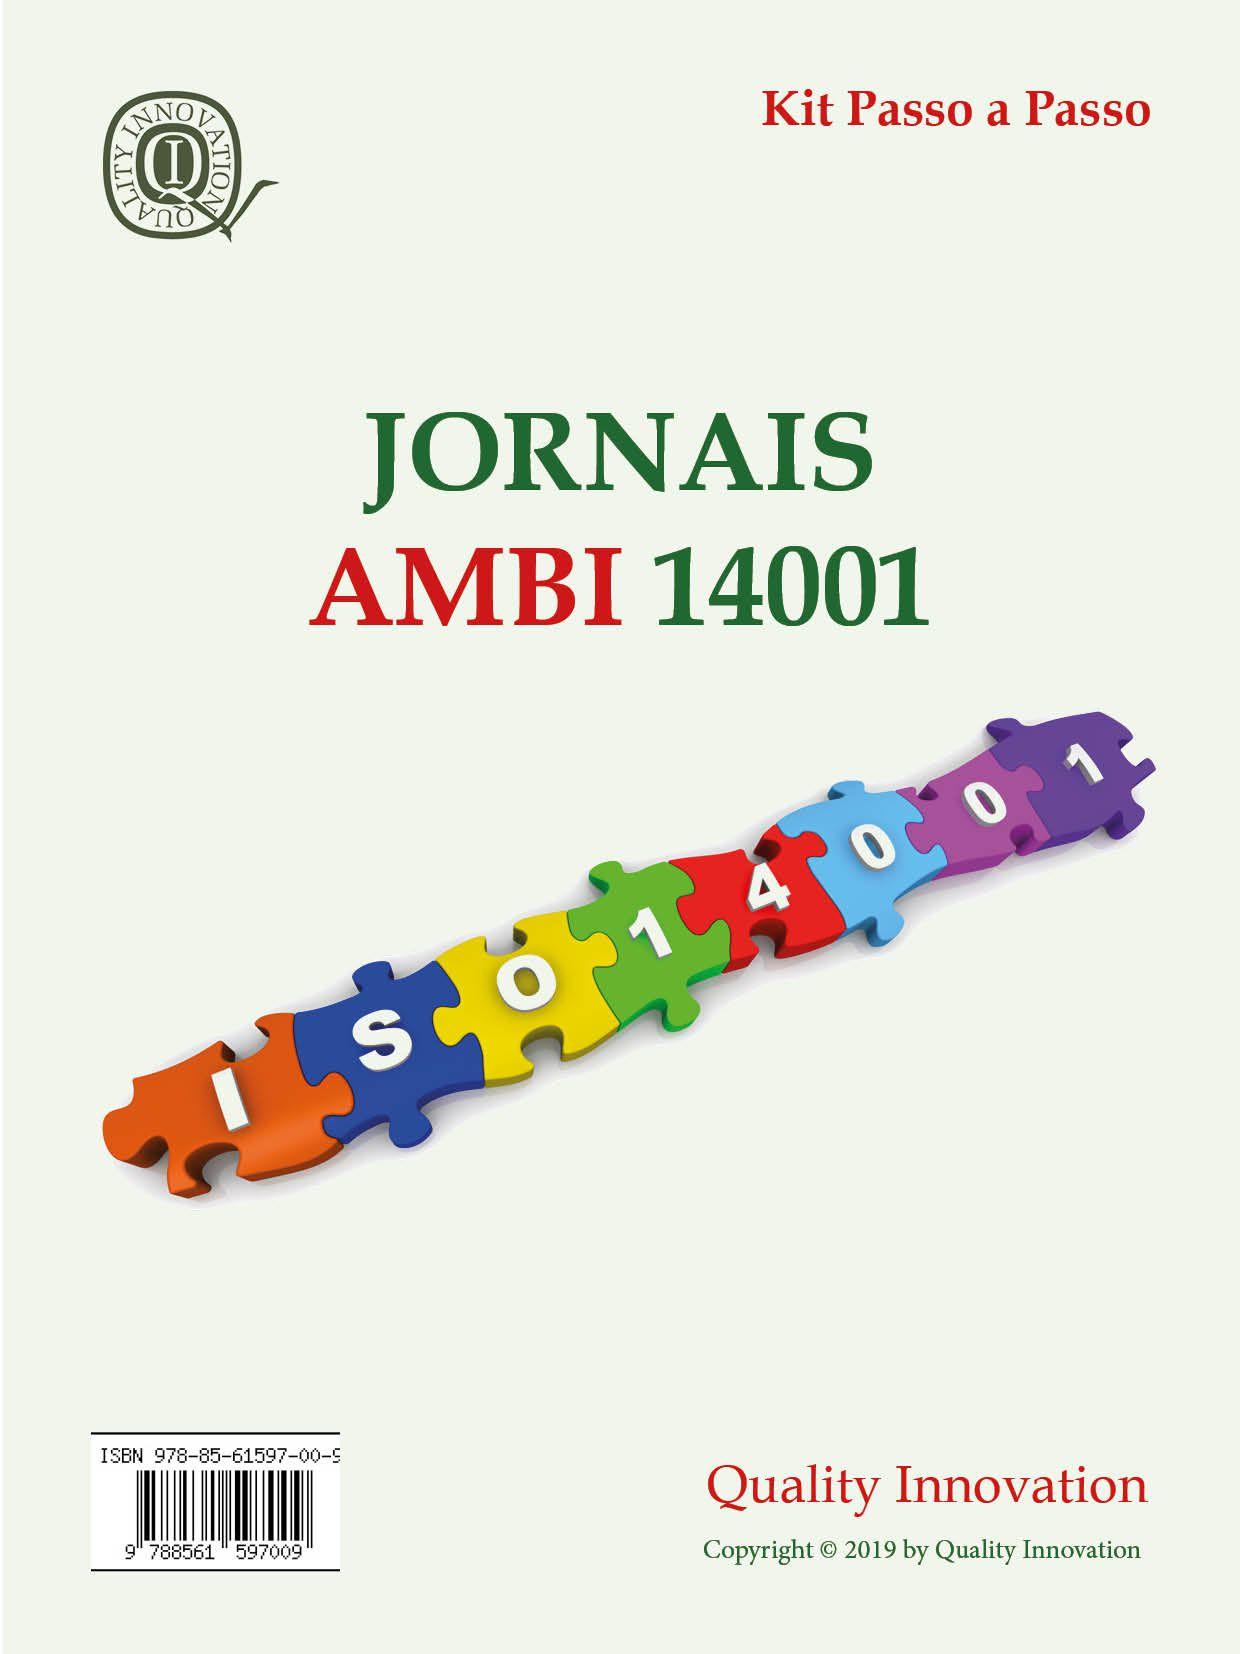 Jornais AMBI 14001  - www.qualistore.net.br